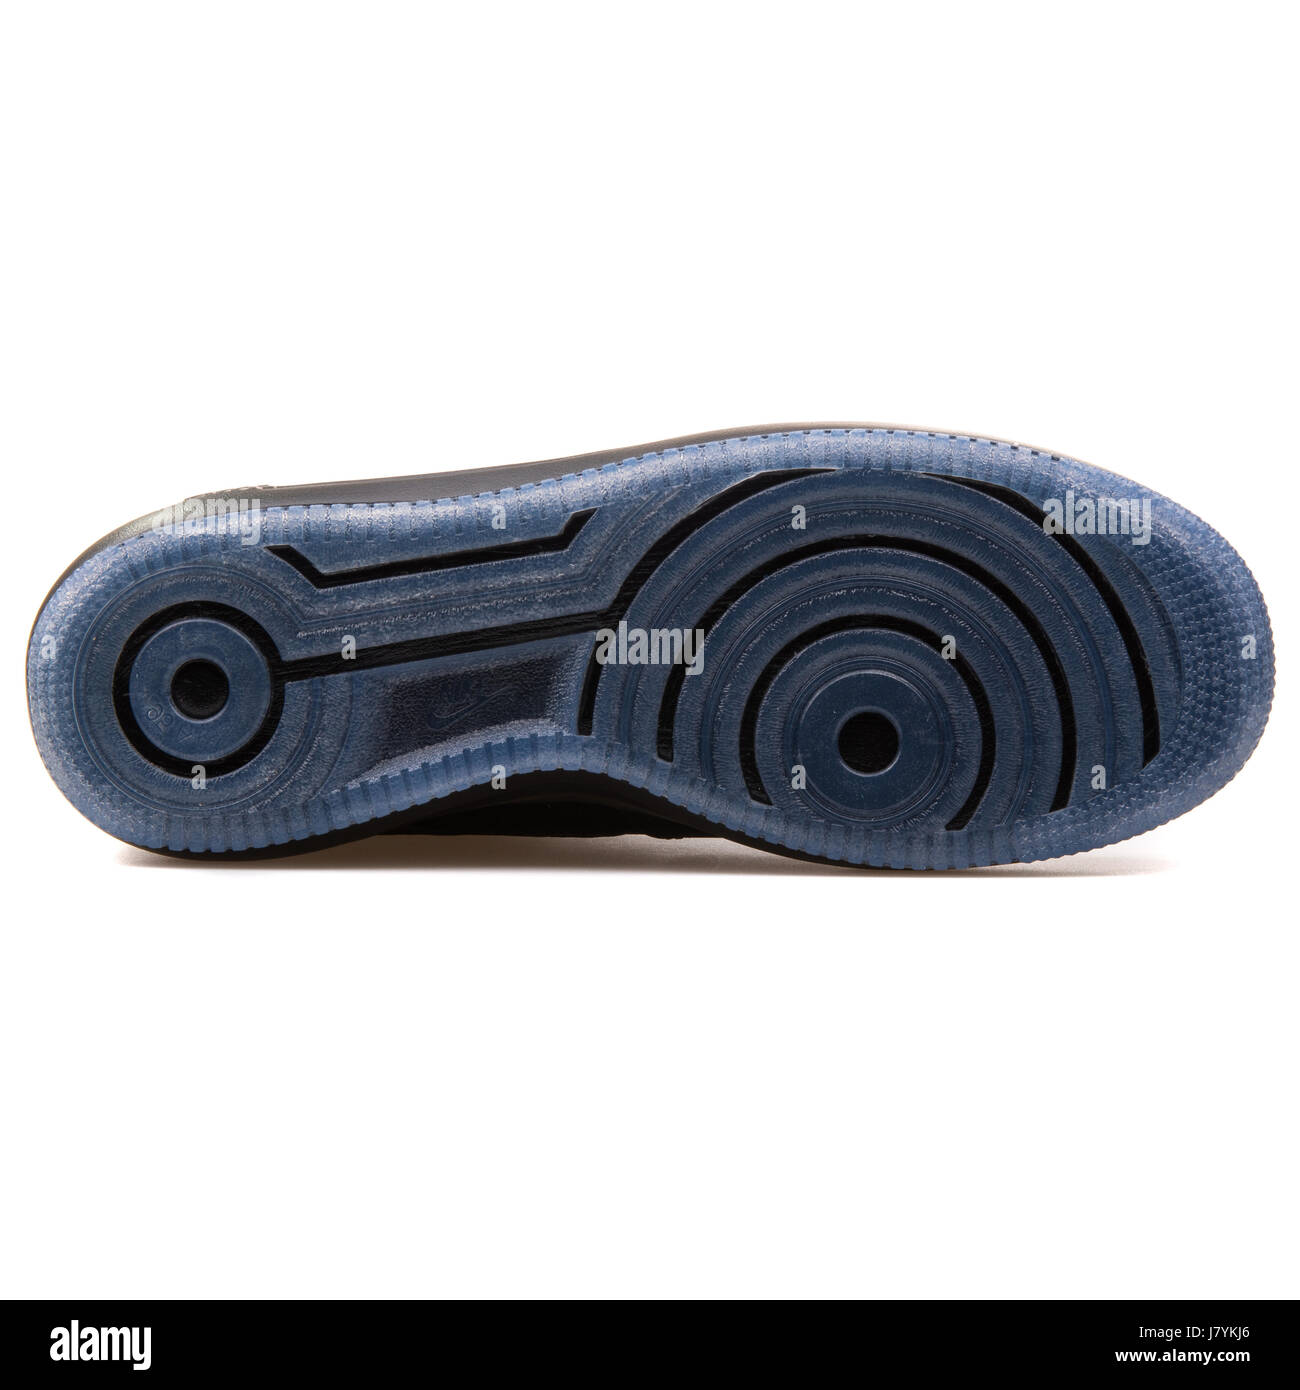 online store 31540 370ec Nike Lunar Force 1  14 Men Black Sneakers - 654256-001